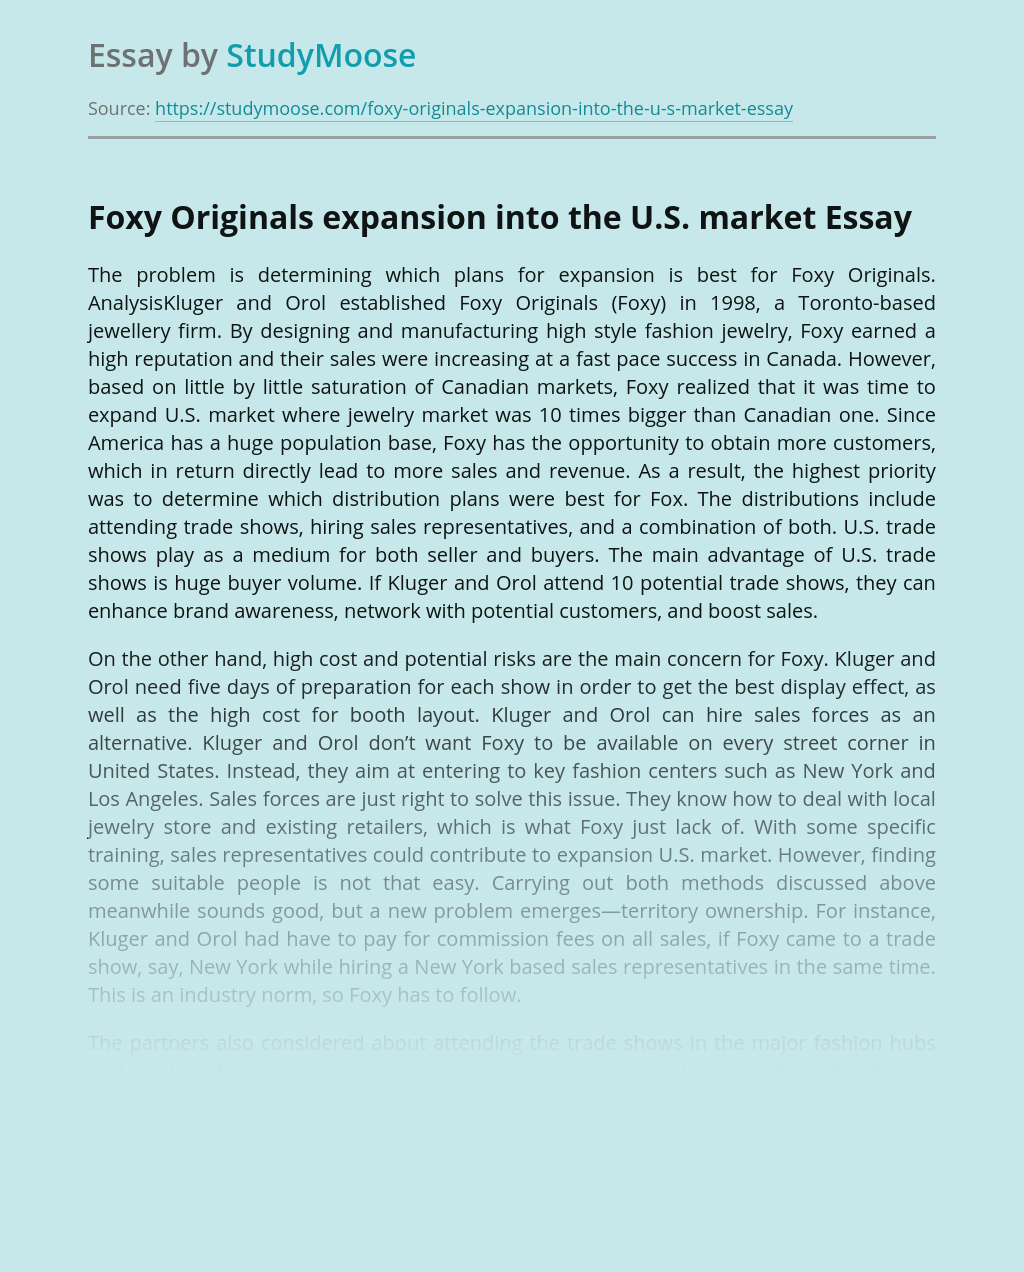 Foxy Originals Expansion Into the U.S. Market